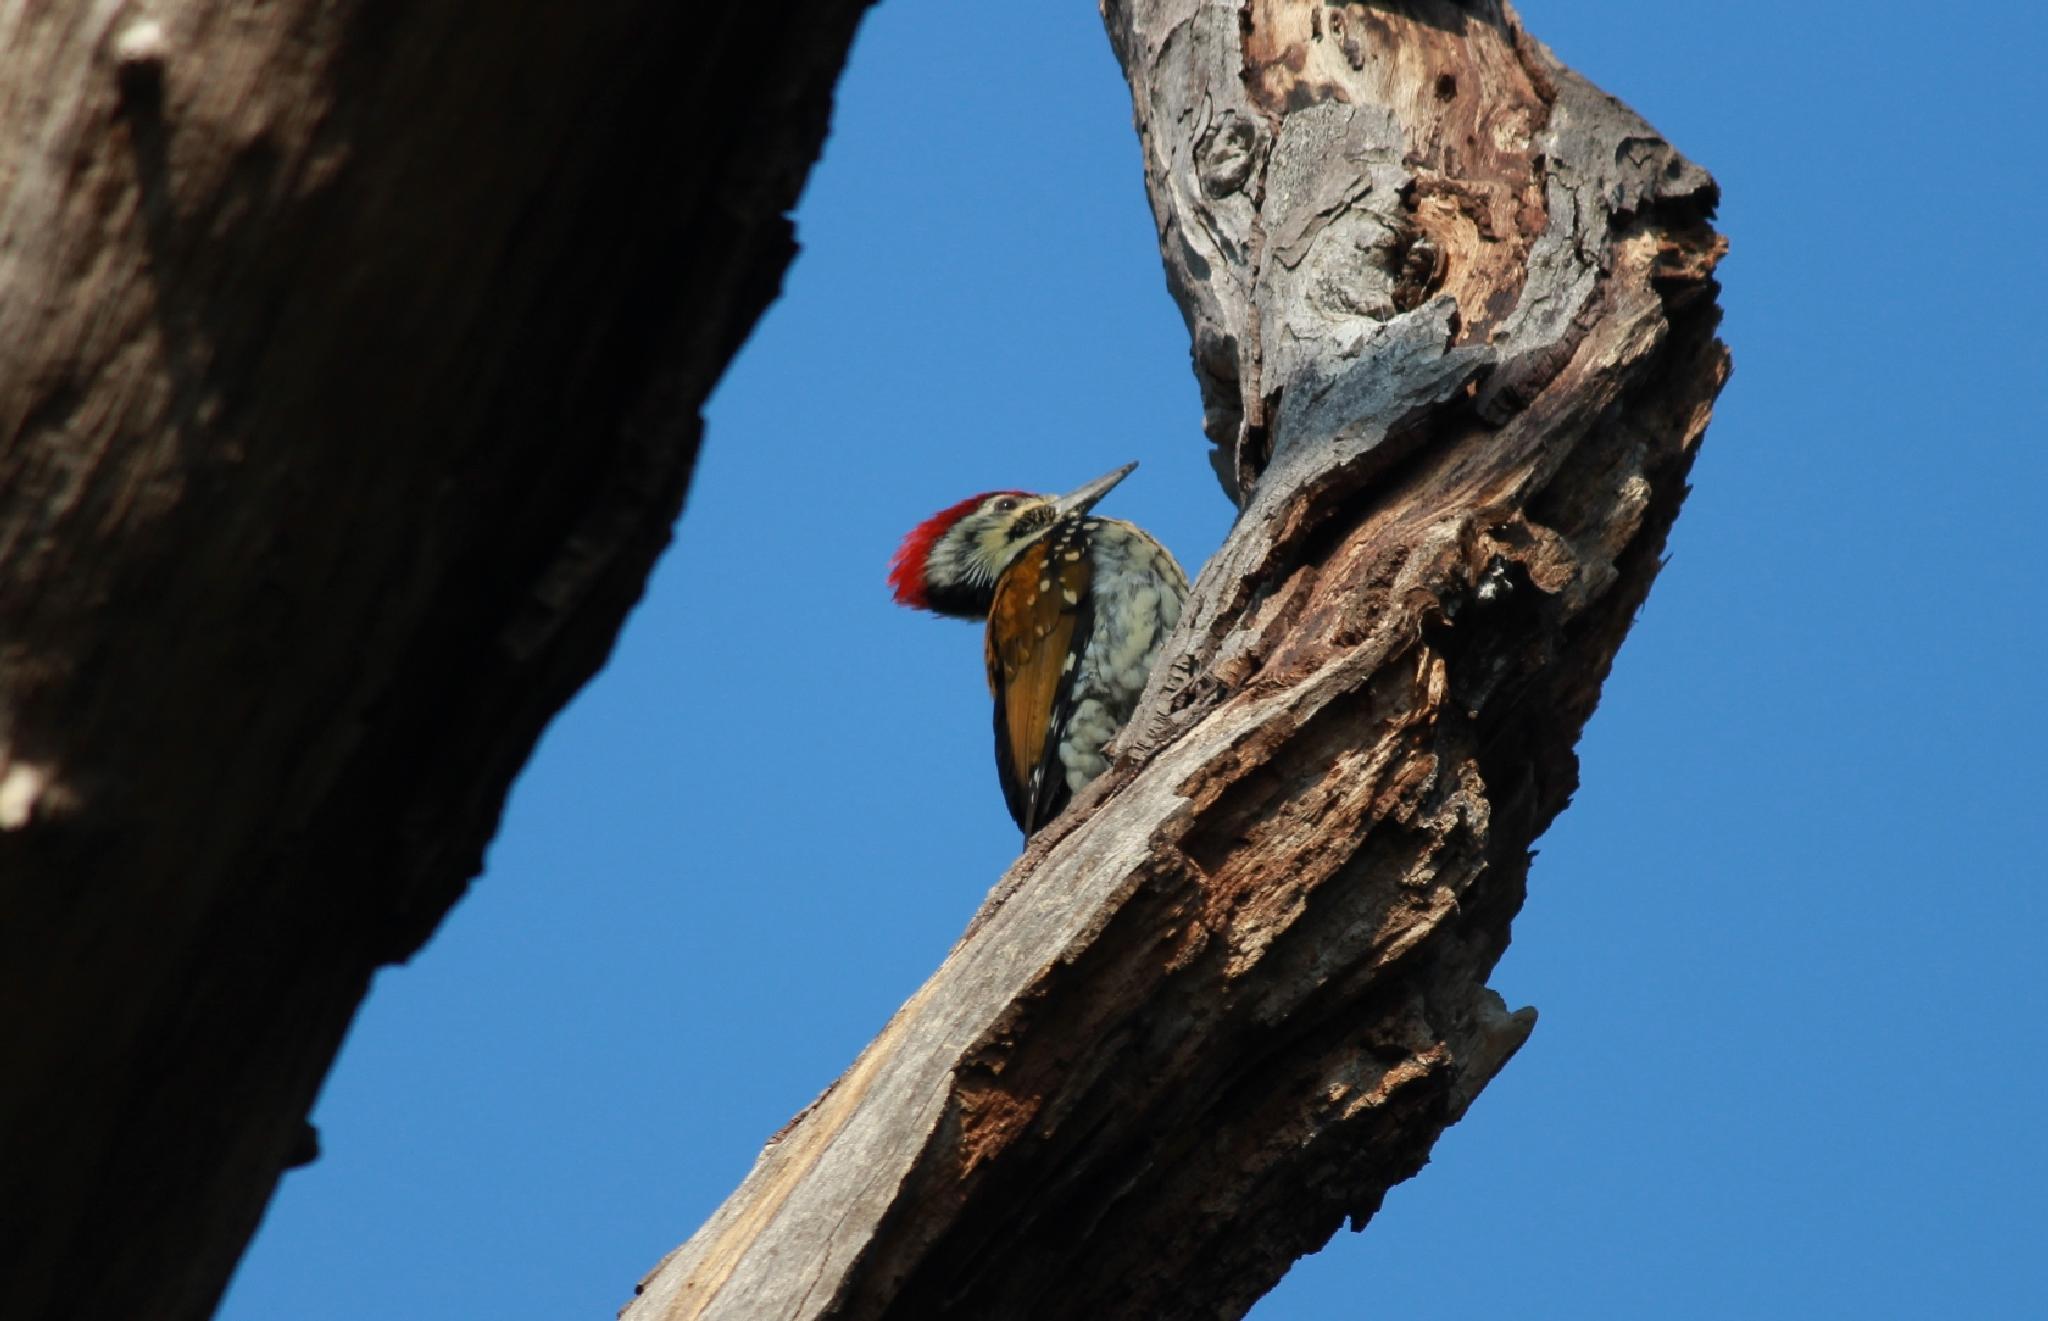 Flameback Woodpecker by Piyush R. Sharma